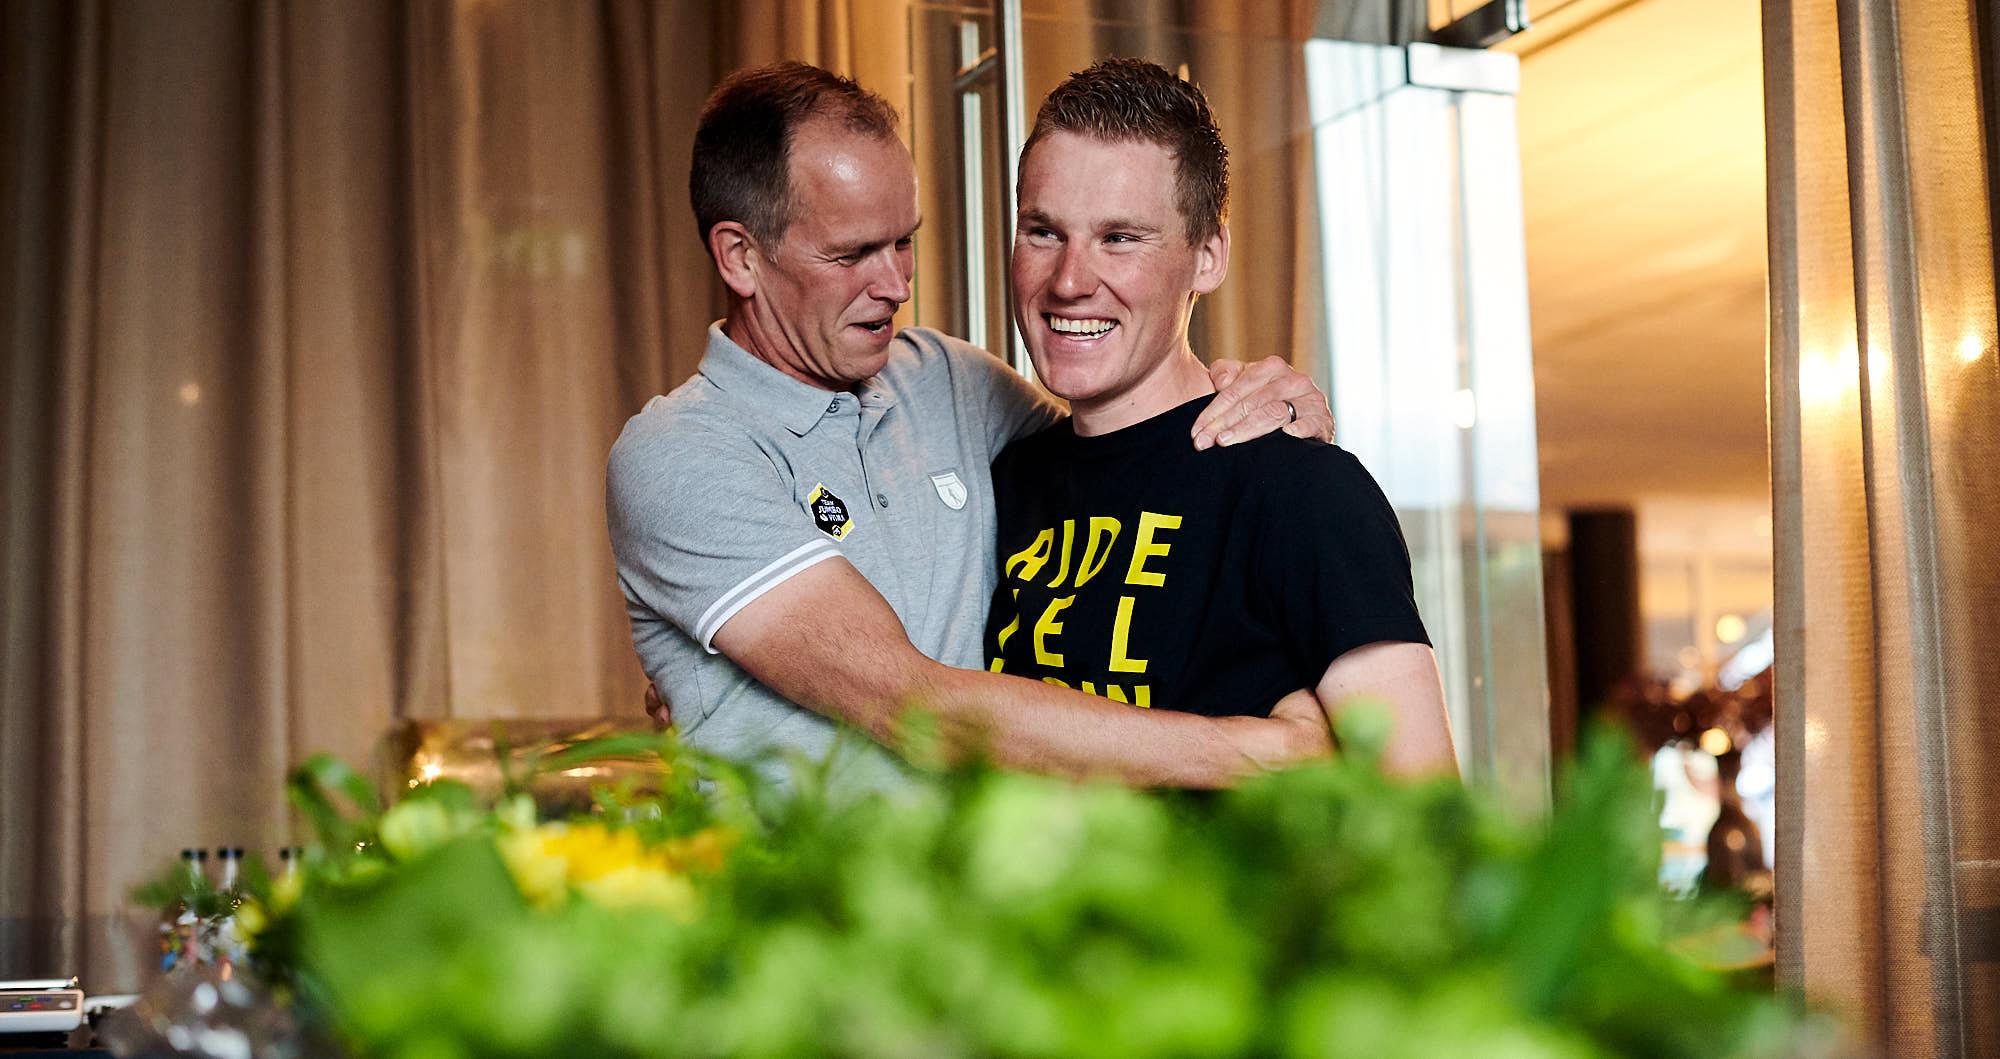 Jumbo-Visma team manager Richard Plugge embracing Mike Teunissen